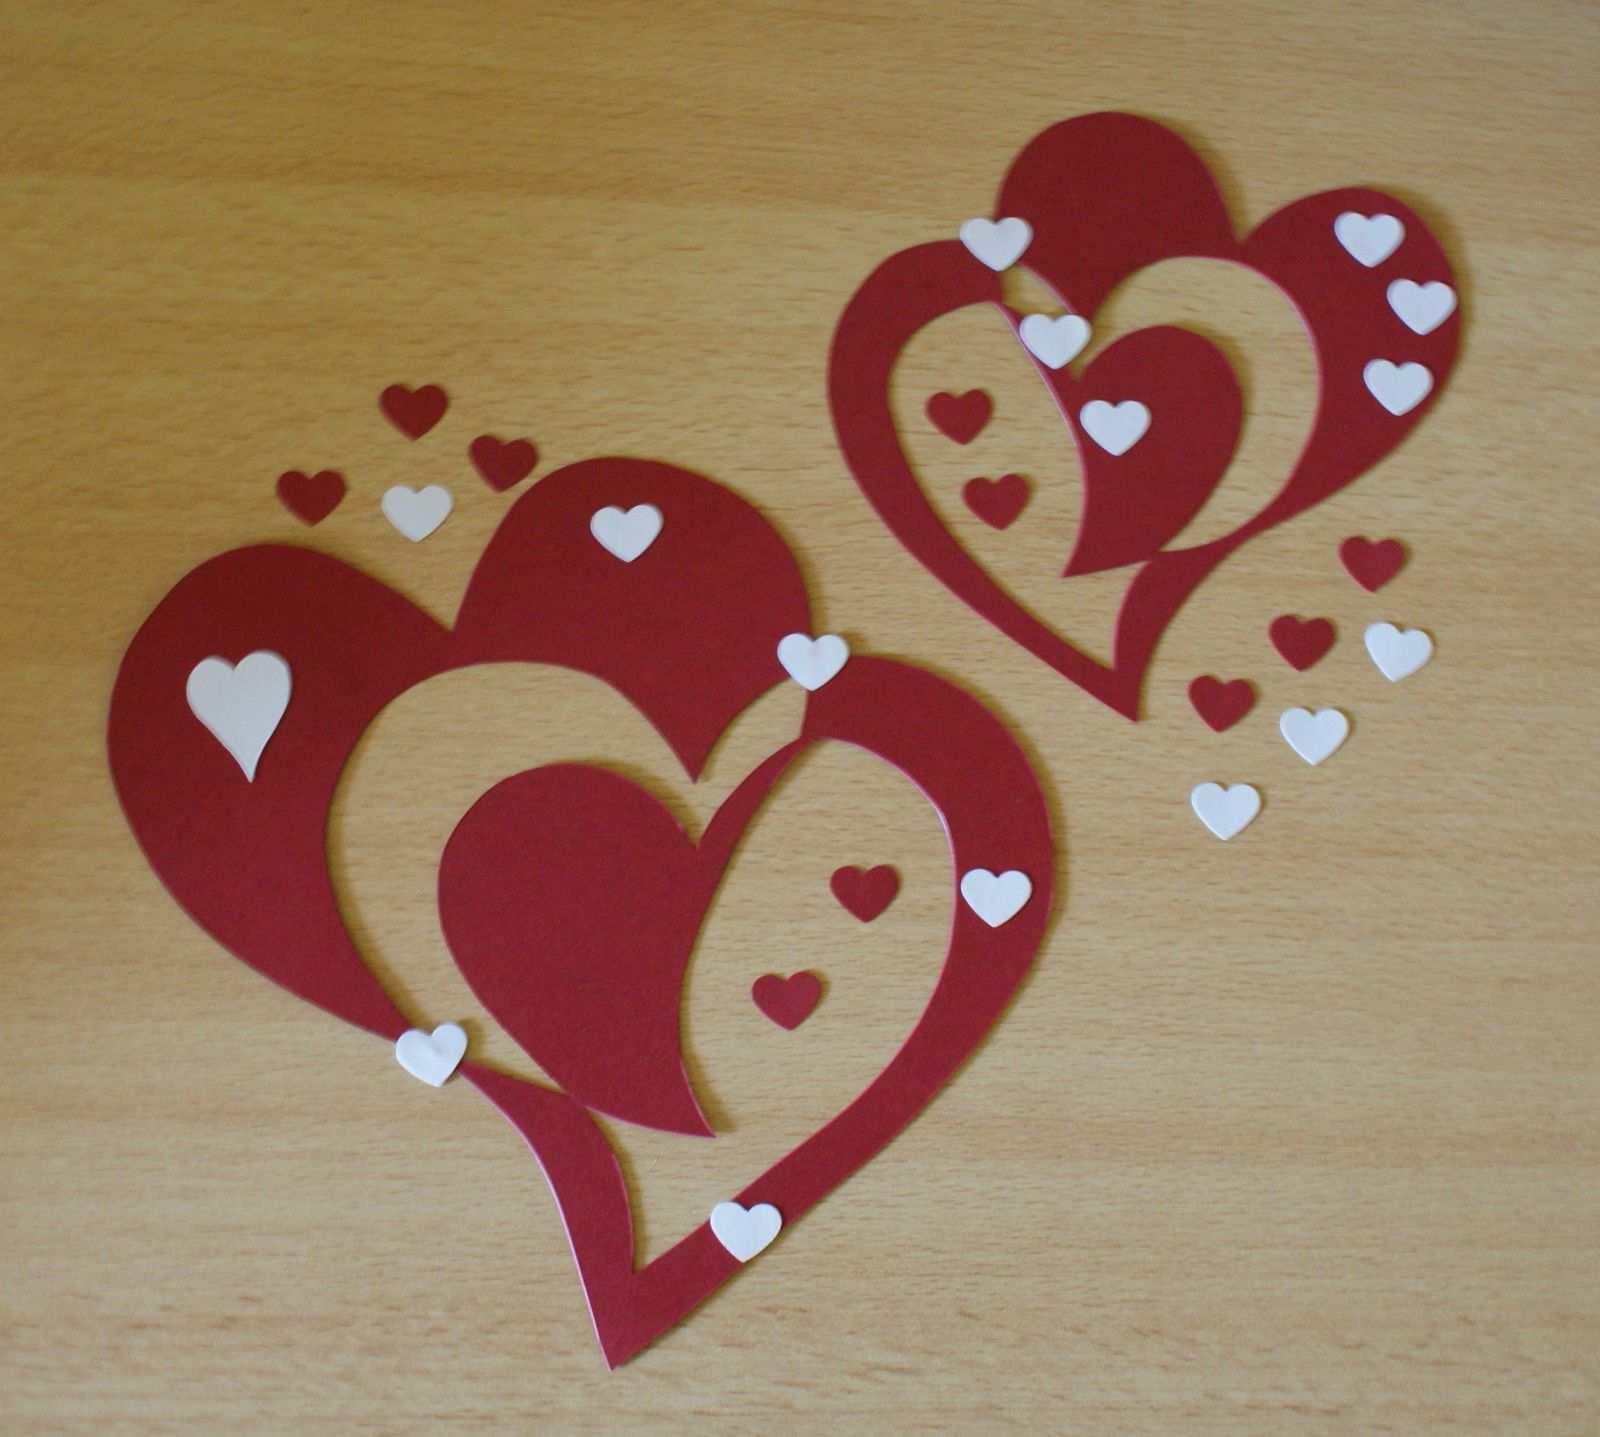 Fensterbild Doppelherzen Herz Tonkarton Filigran Herbst Deko Liebe Freundschaft Eur 3 20 Tonkarton Basteln Anleitung Valentinstag Dekoration